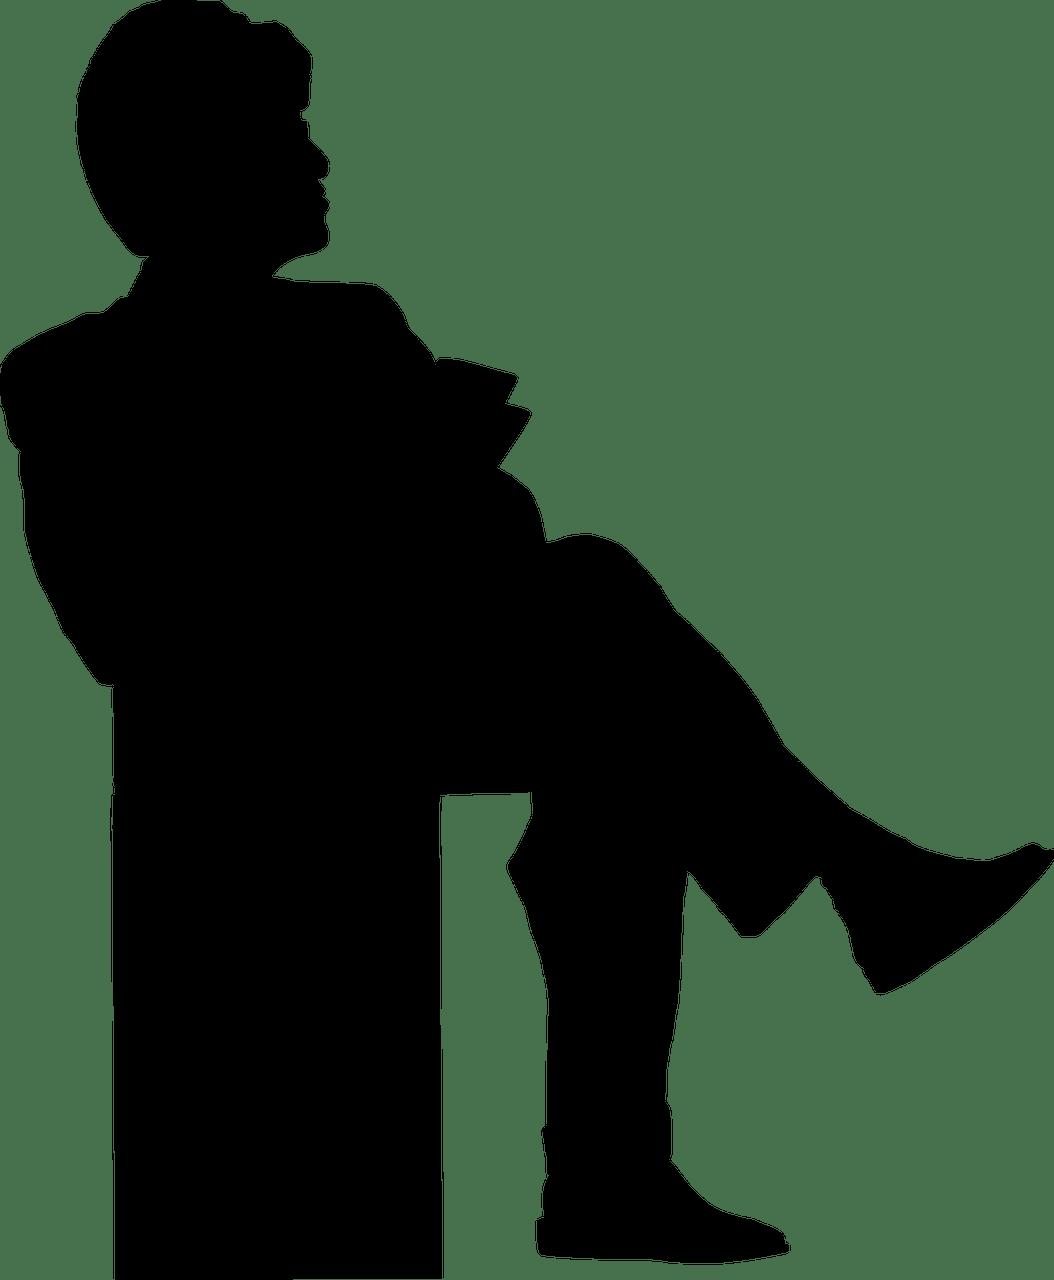 Orang Vector Png : orang, vector, Sitting, Vector, Graphic, Pixabay